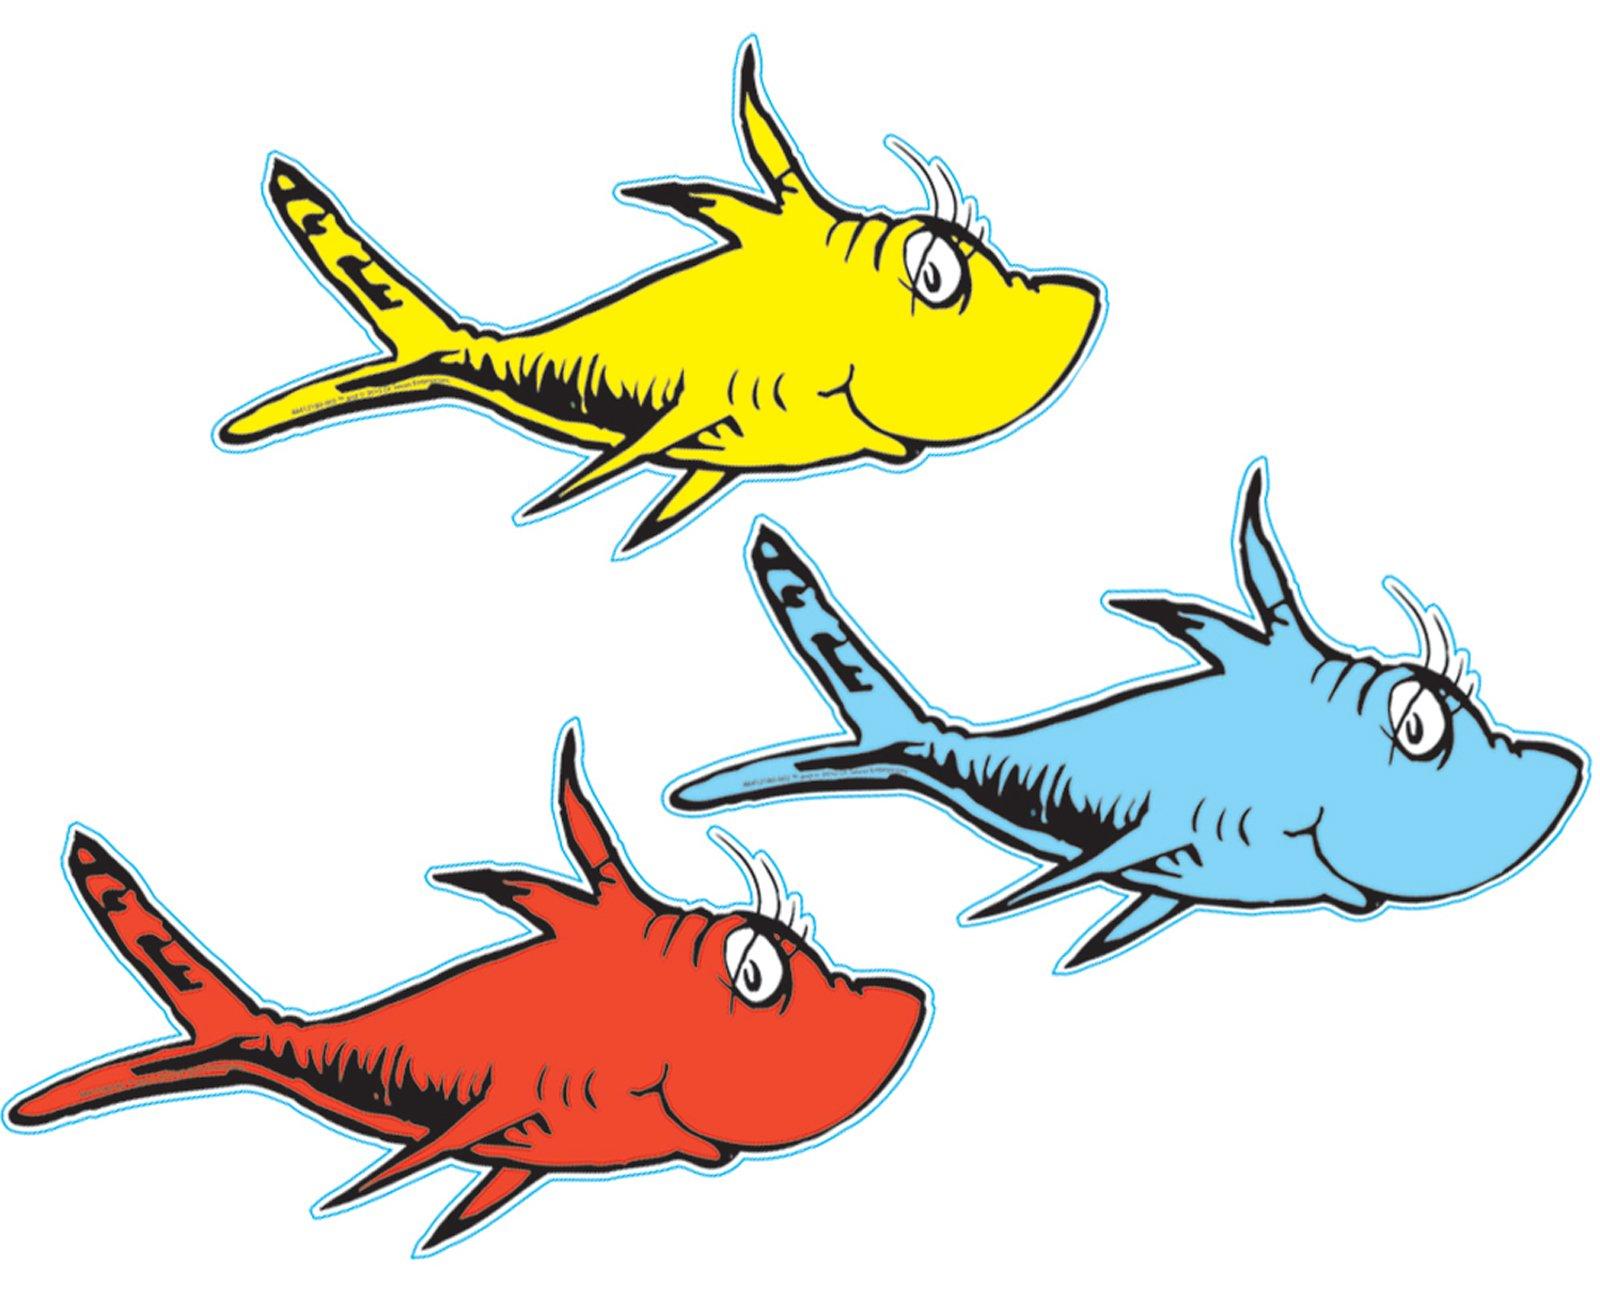 Clipart Fish Bowl - Cliparts.co (1600 x 1314 Pixel)